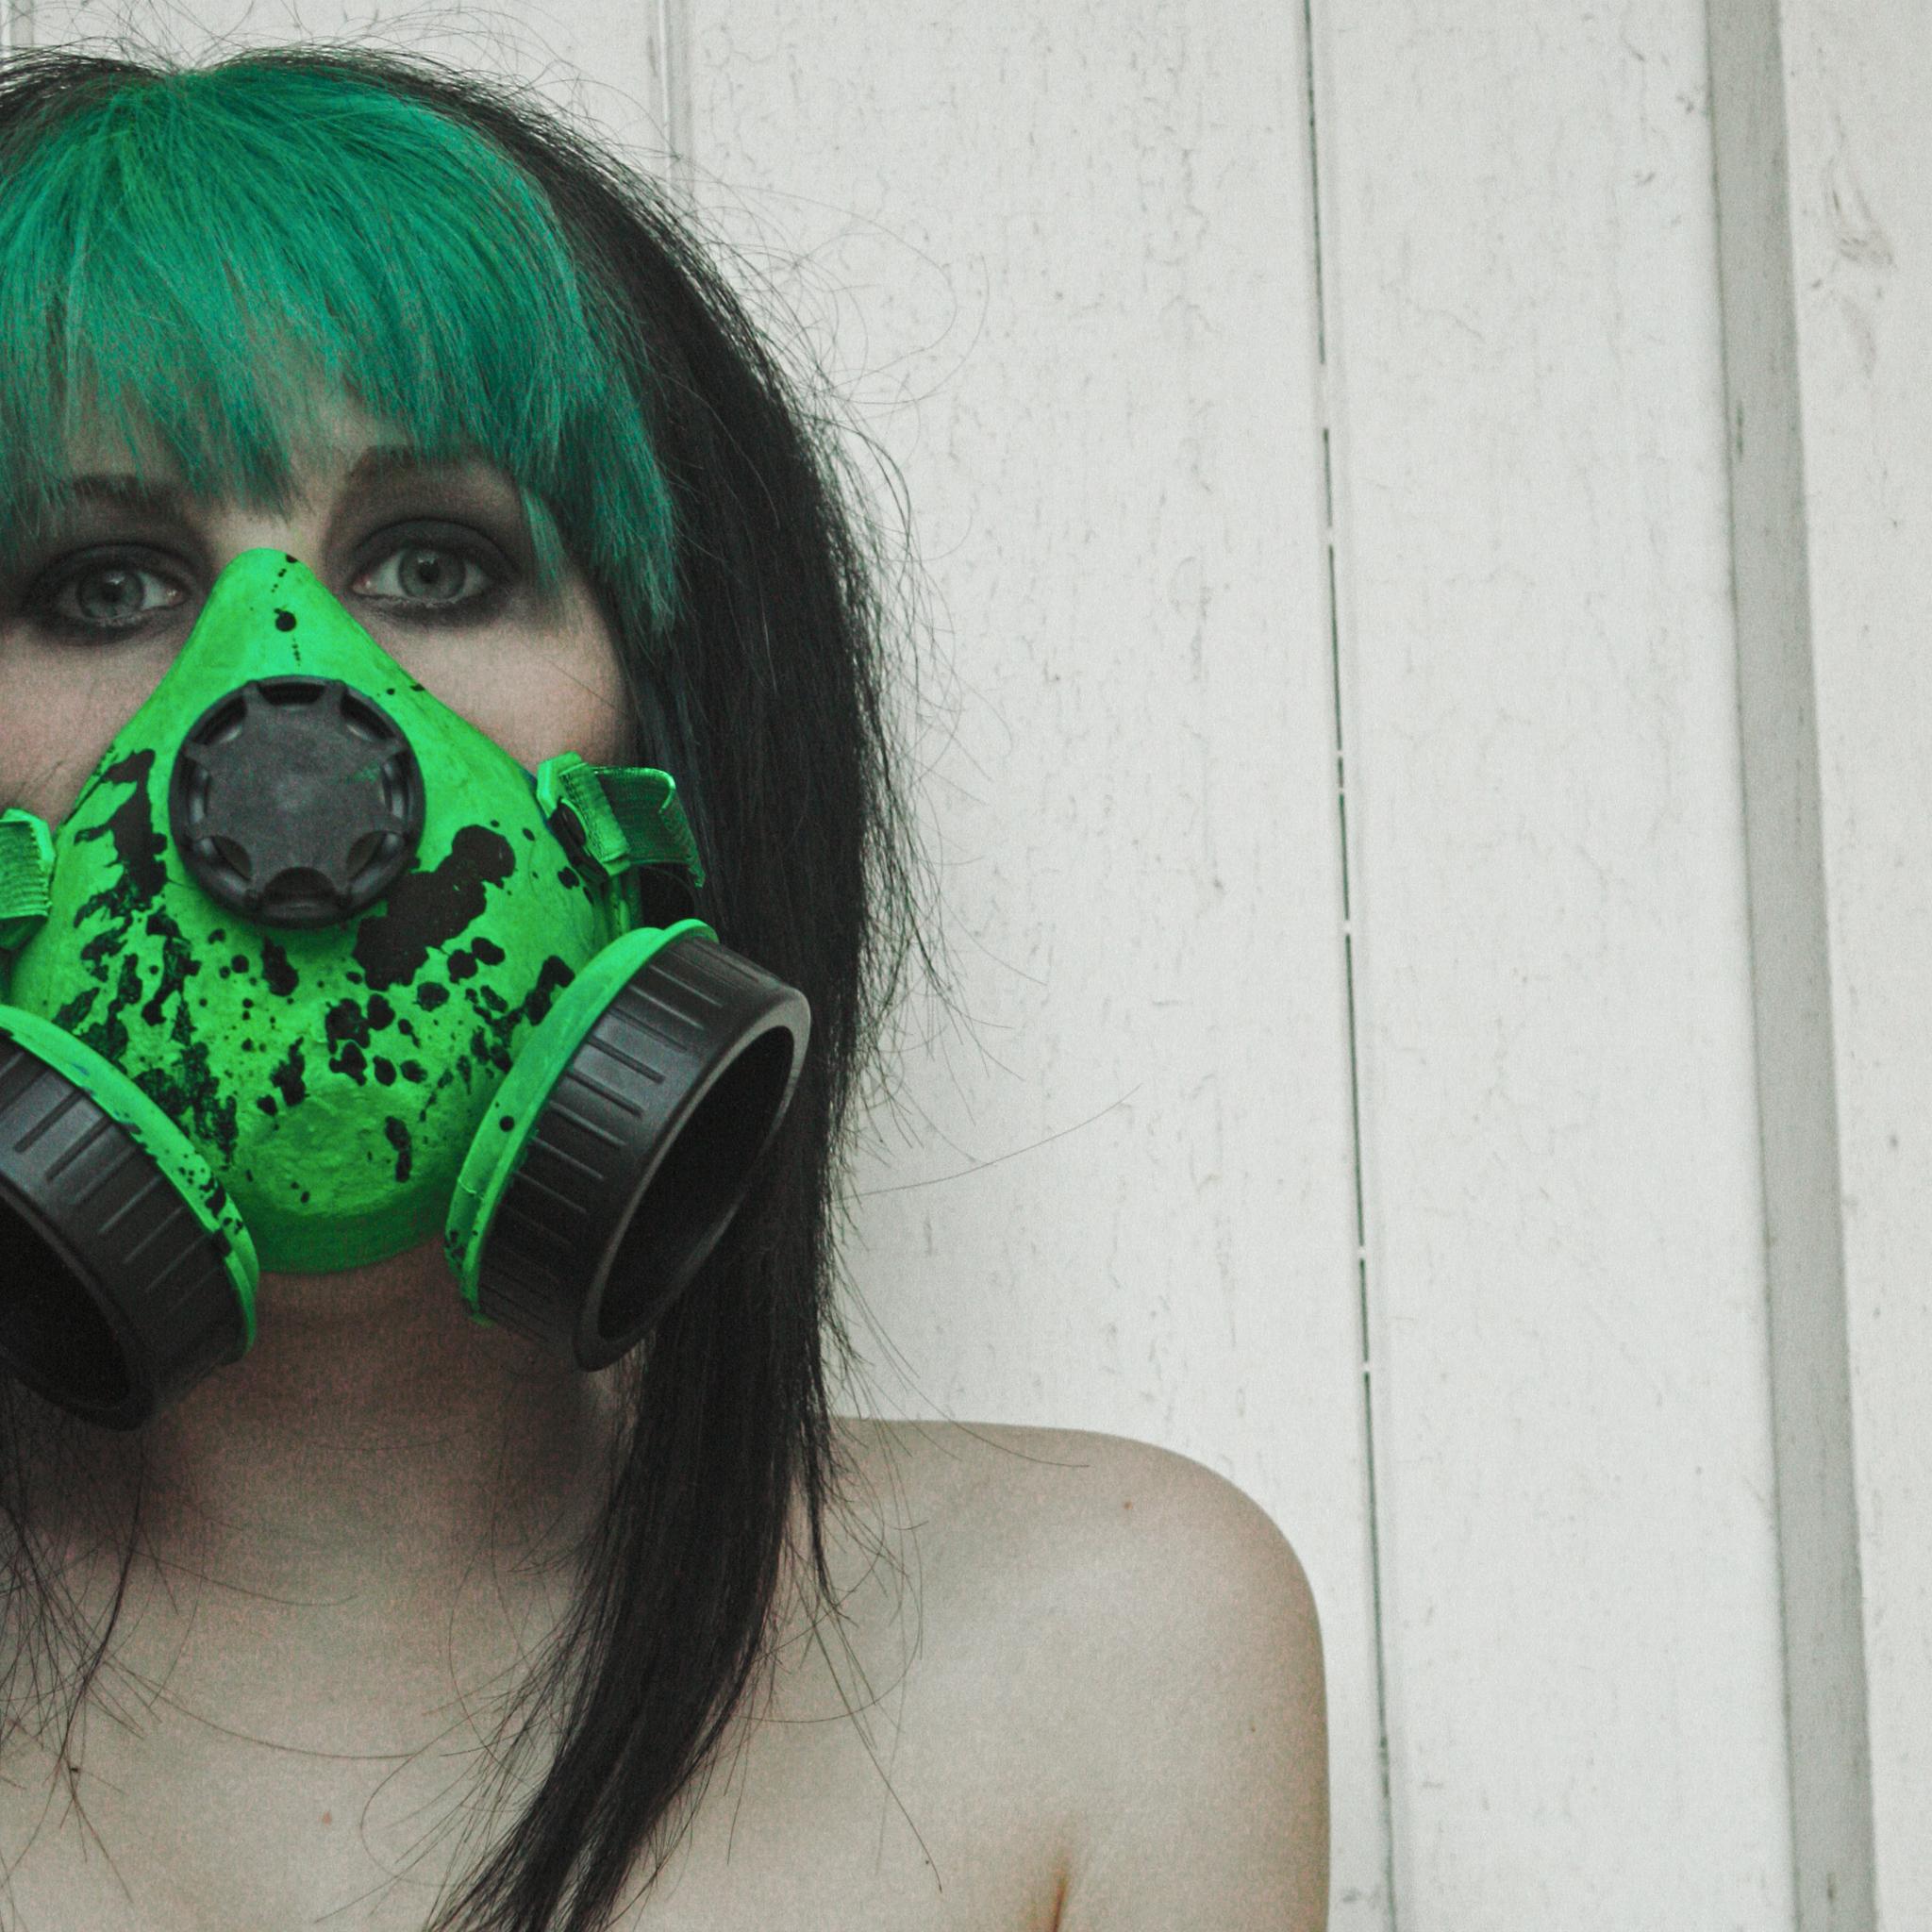 Girl with spray mask 3 Wallpapers iPad Girl with Spray Mask   iPad